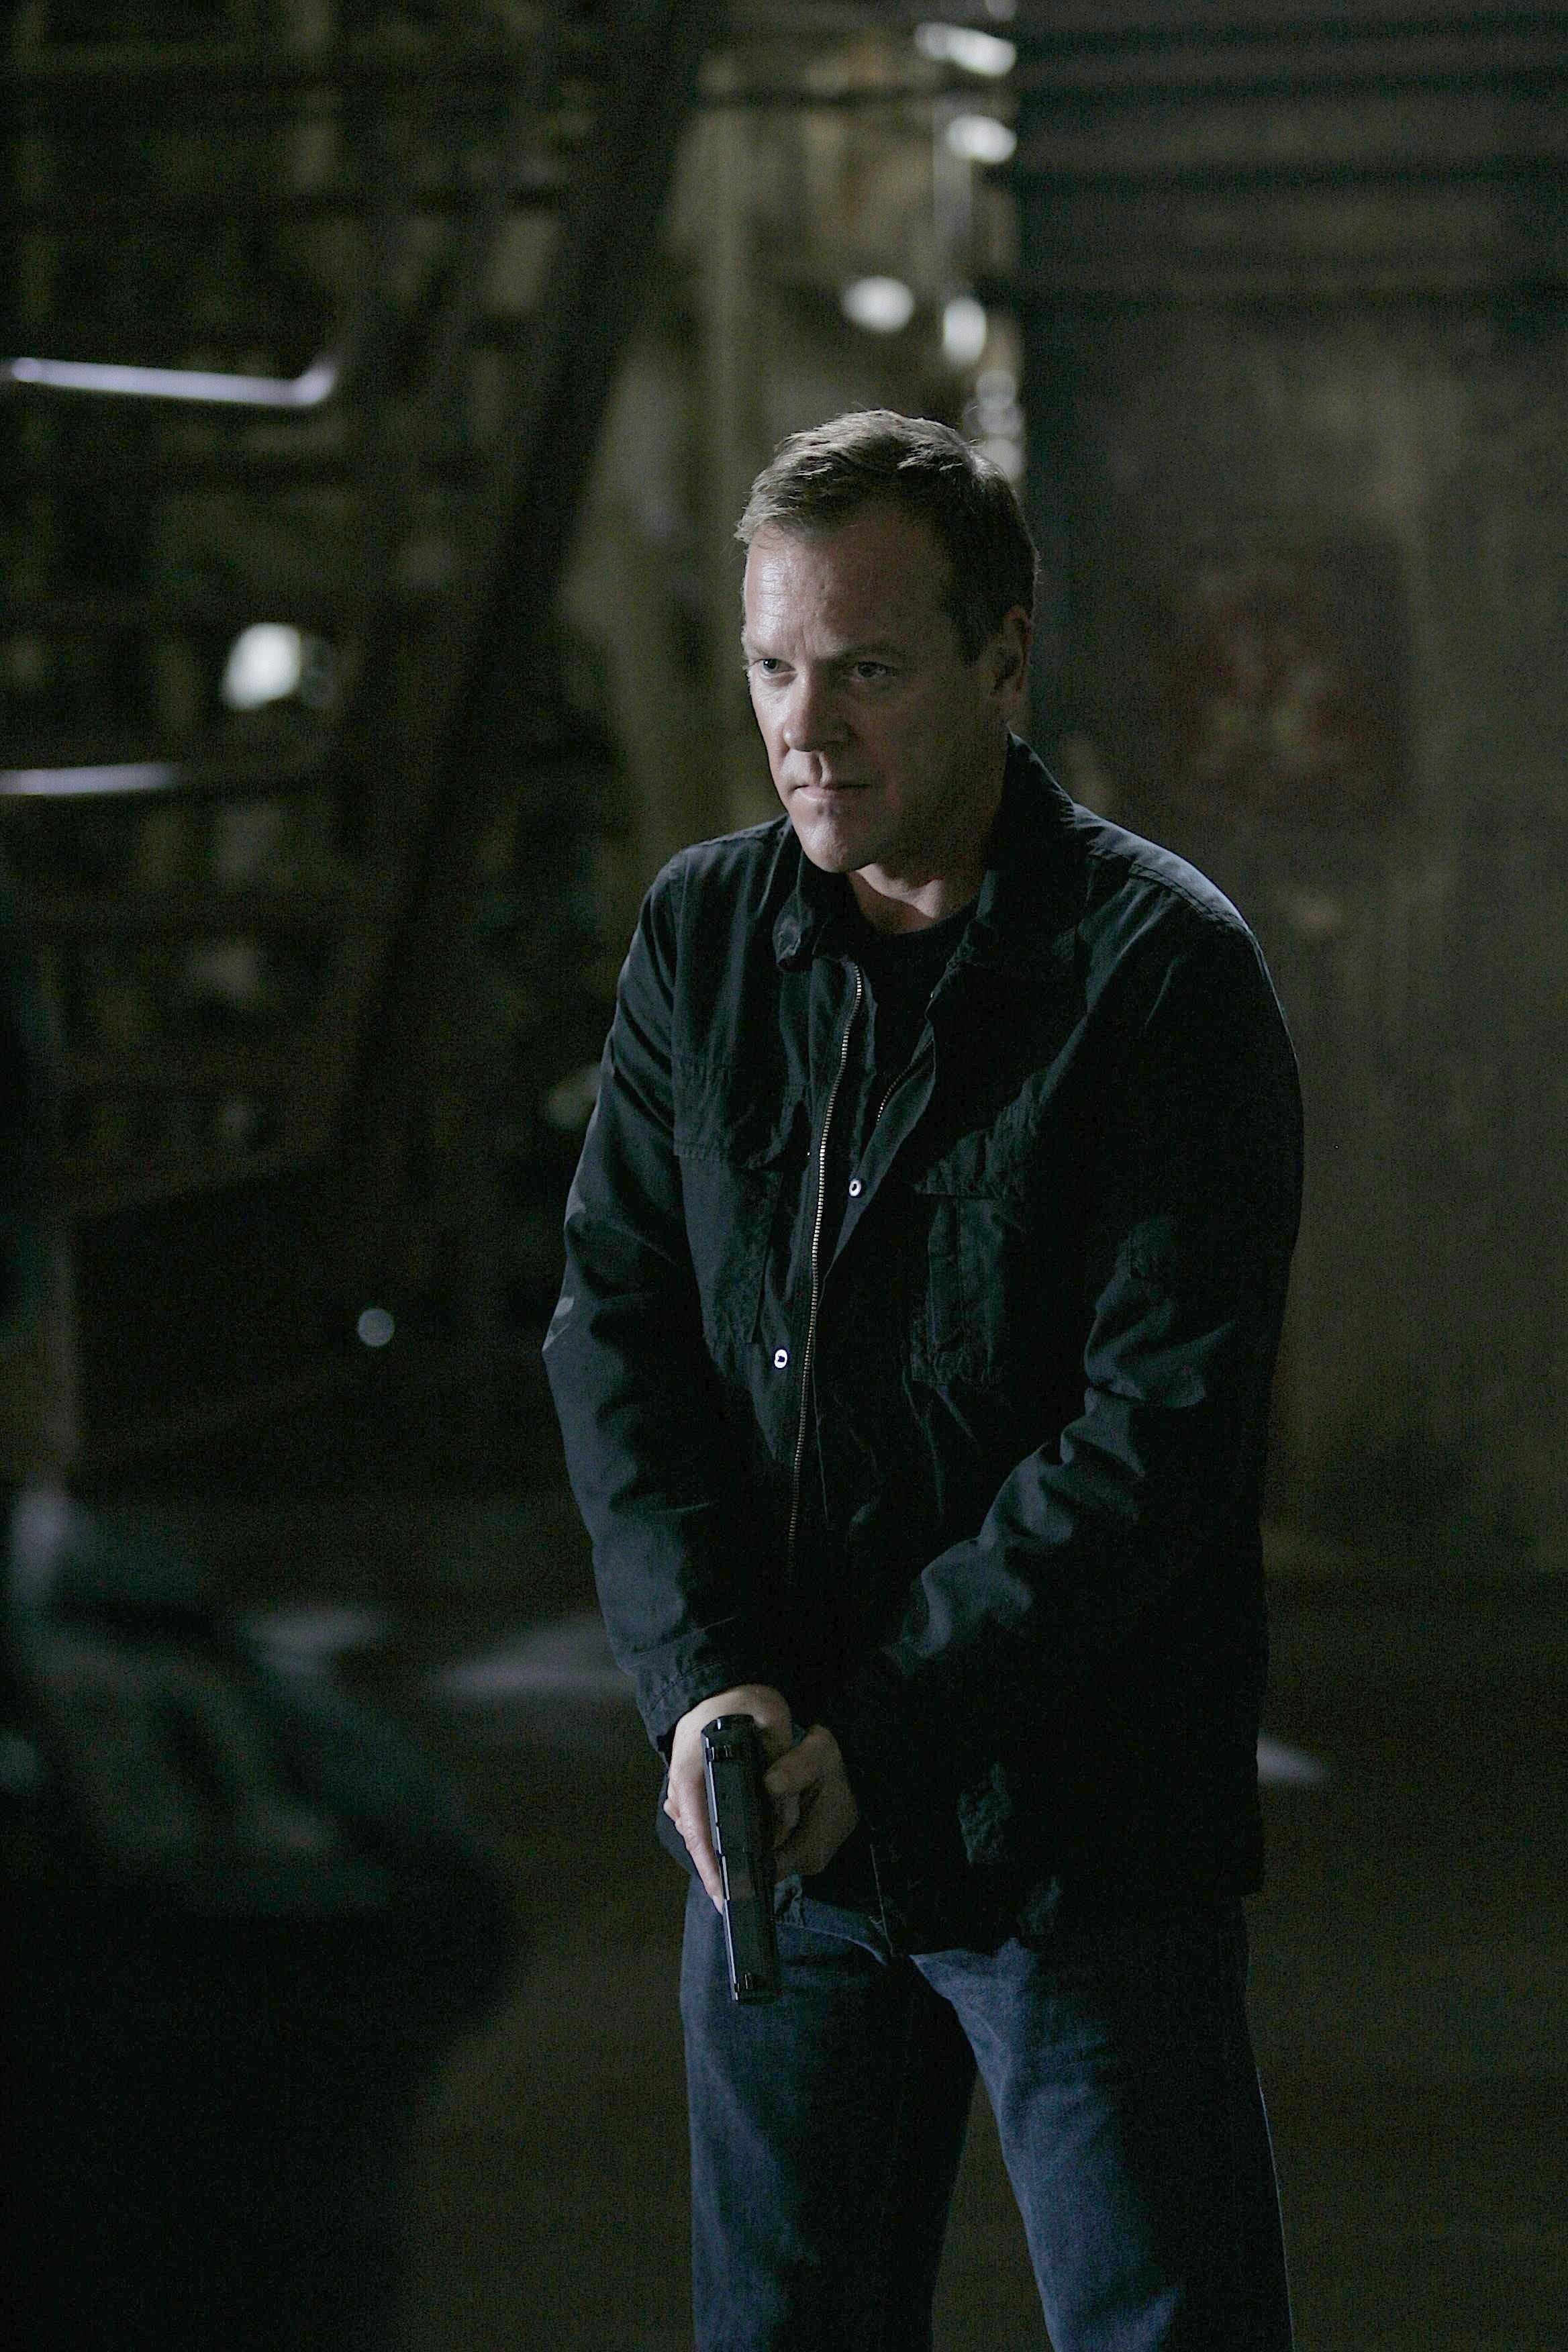 jack bauer with gun 24 season 7 episode 24